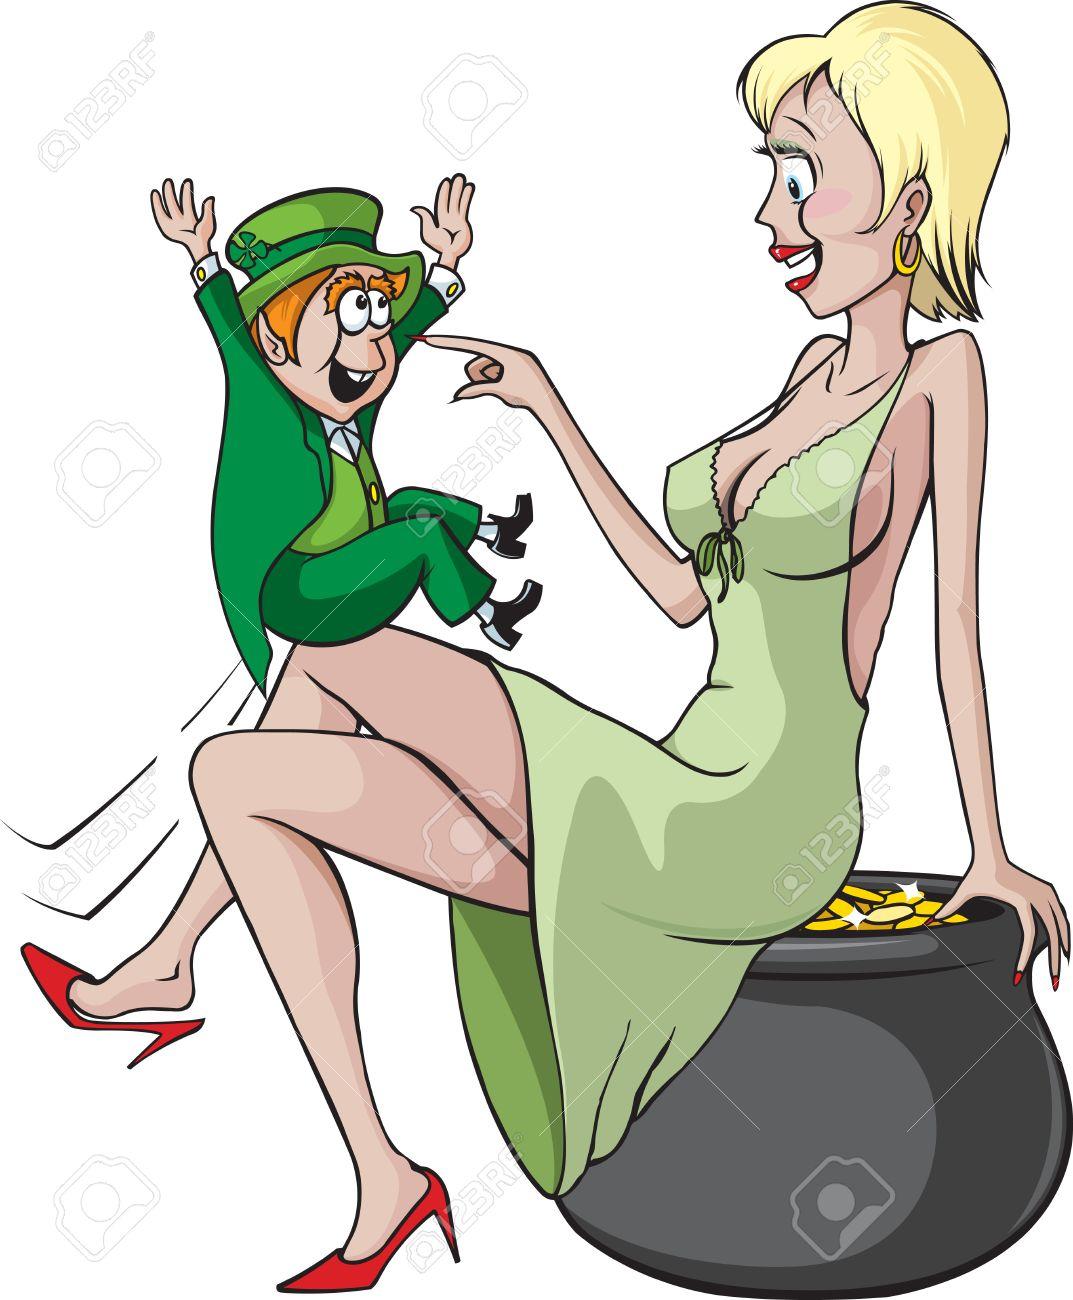 sexy woman and leprechaun cartoon woman, pot of gold and leprechaun